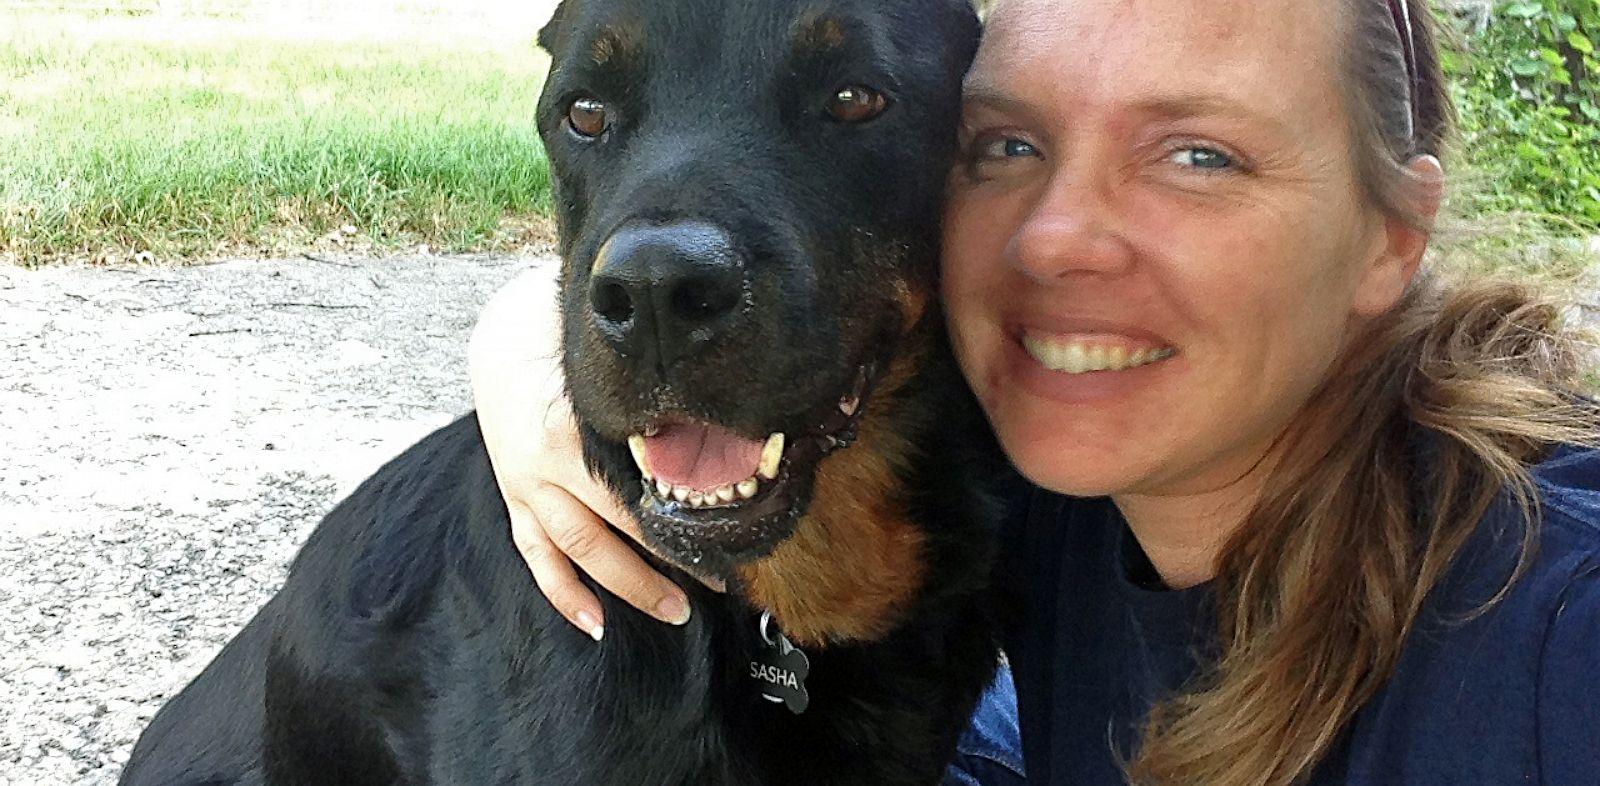 PHOTO: Jennifer Koczan and her Rottweiler Sasha